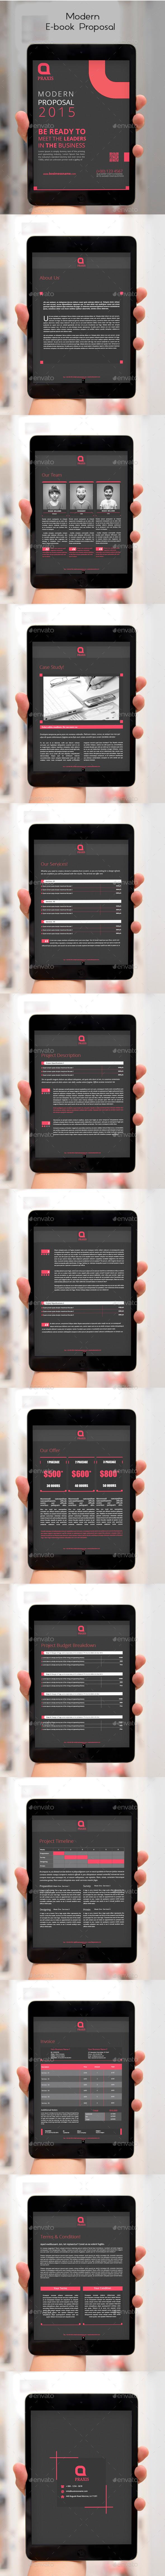 Modern E-book Proposal - ePublishing